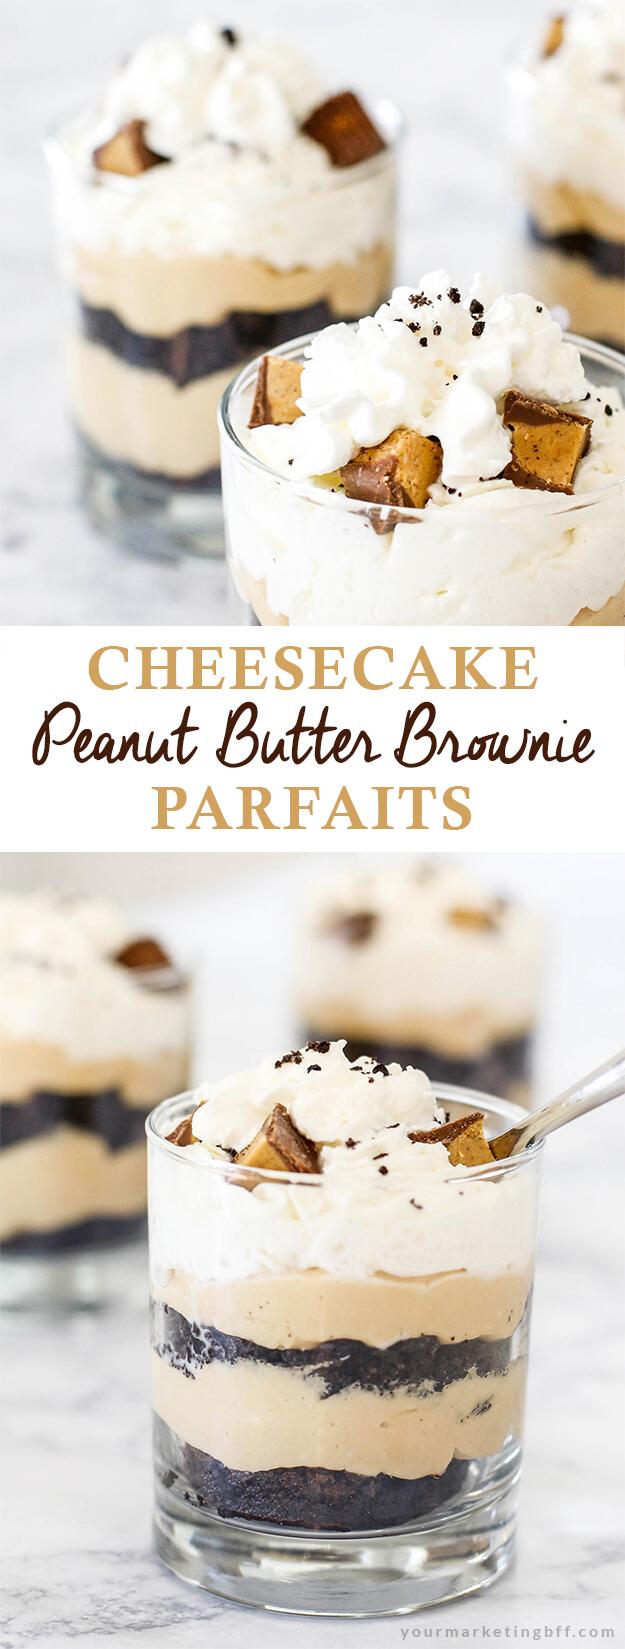 peanut butter brownie cheesecake parfaits